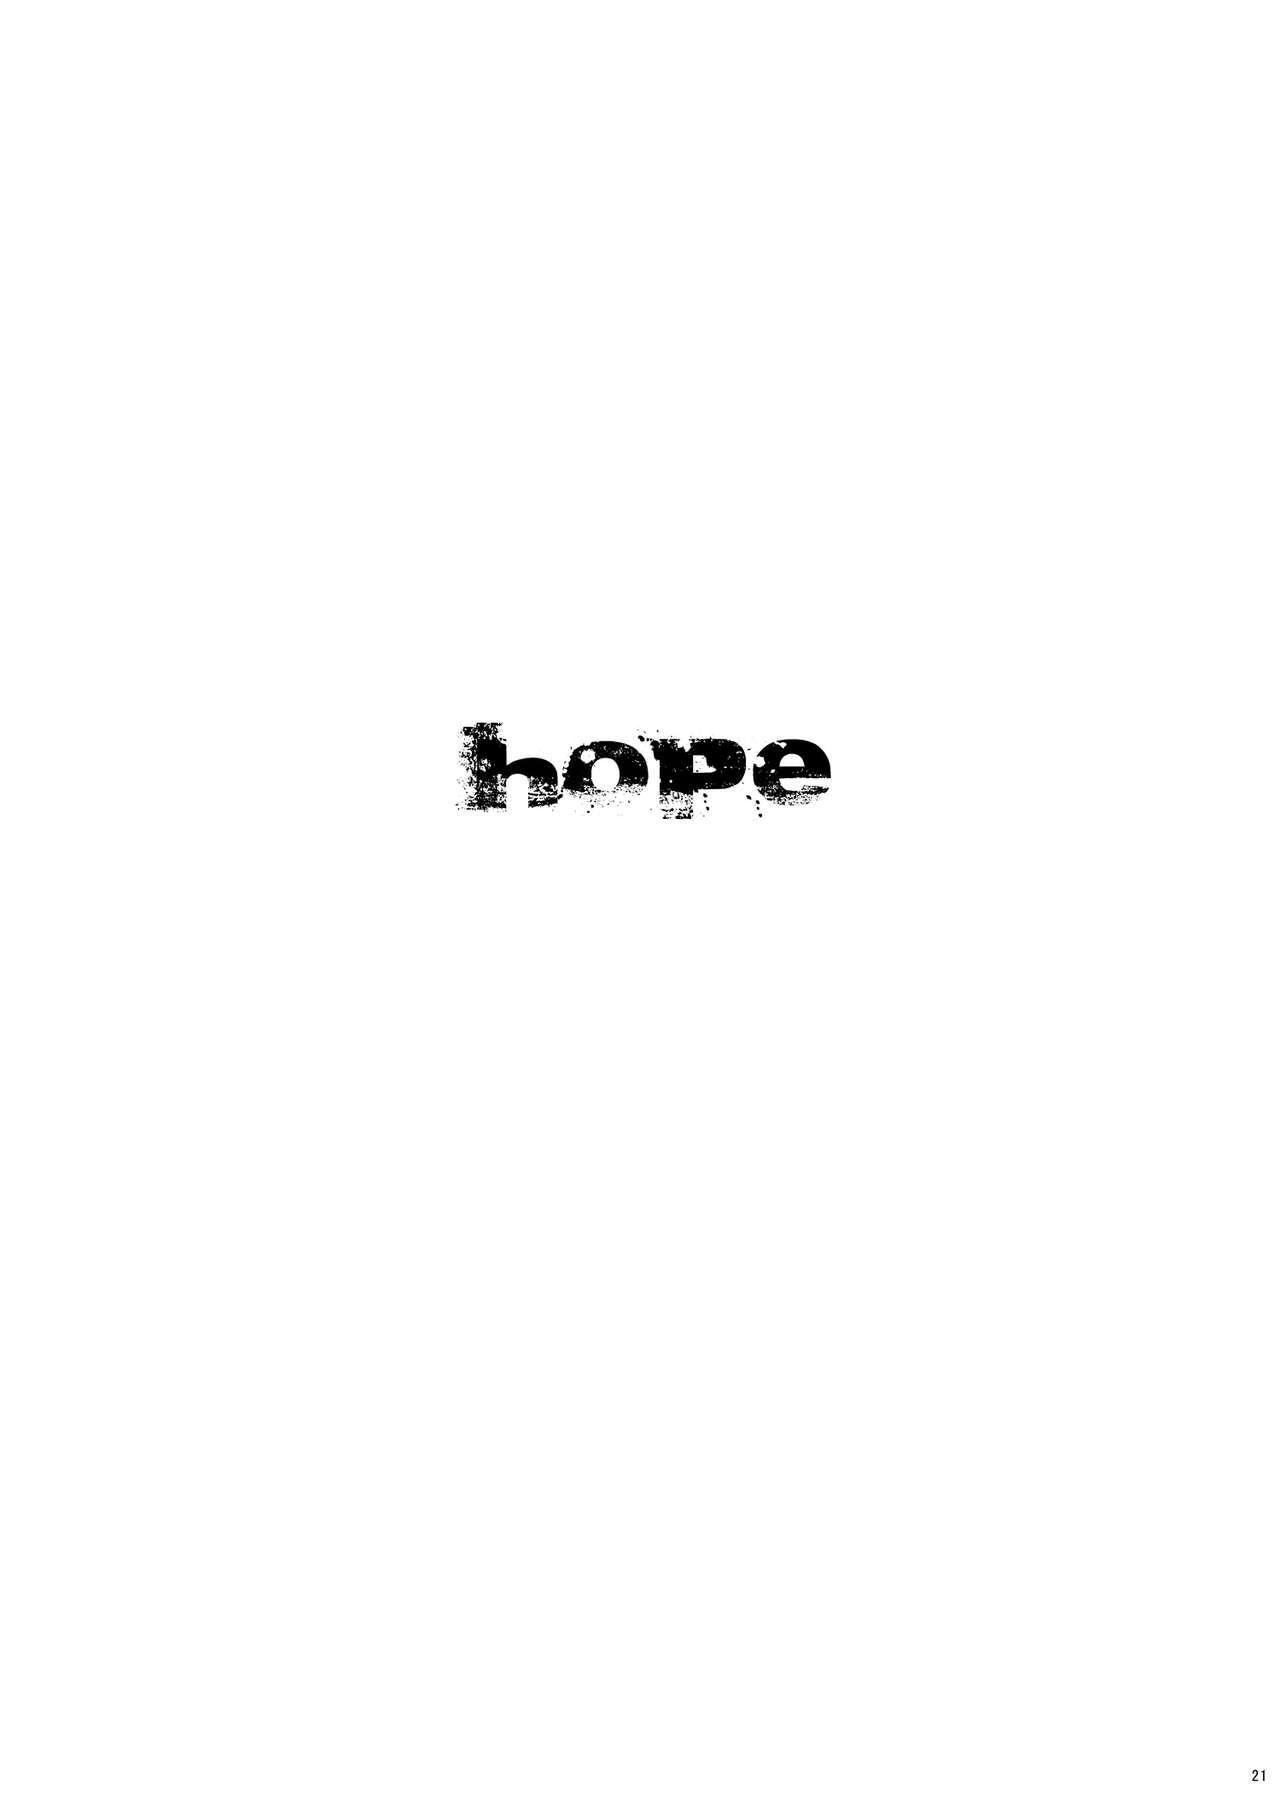 HOPE Soushuuhen01 32